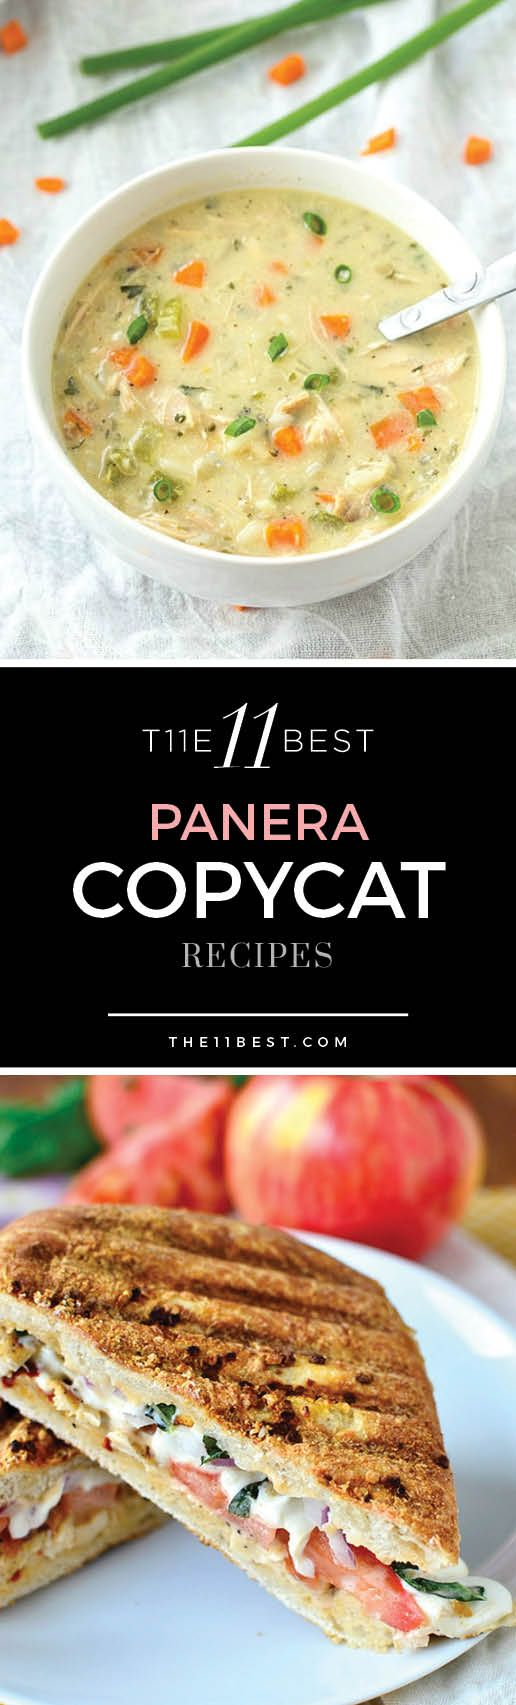 Panera Copycat Recipes. Panera soup recipes. Panera cookie recipe. Panera sandwich recipe.